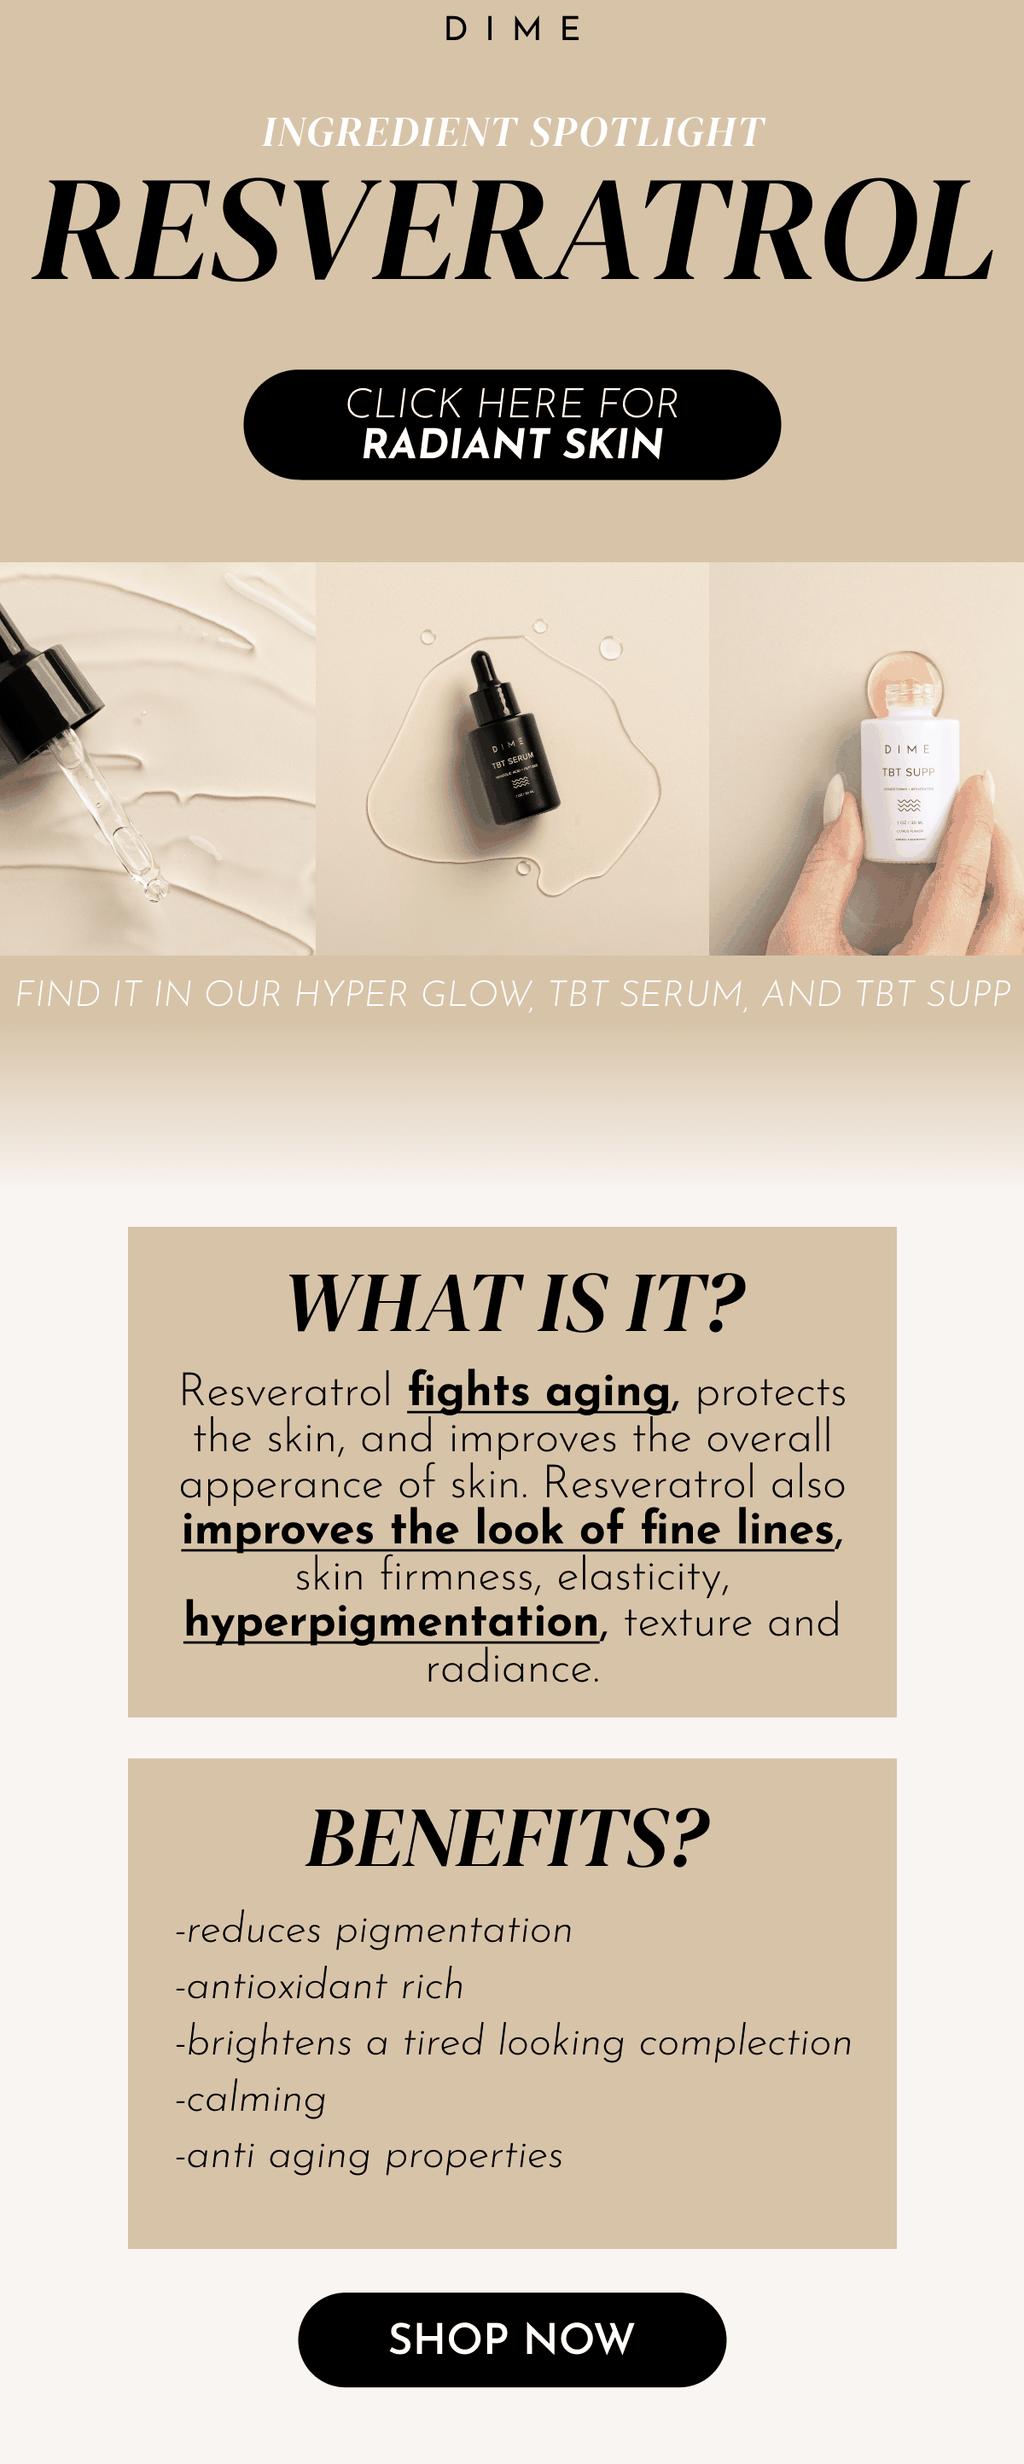 Ingredient Spotlight - Resveratrol